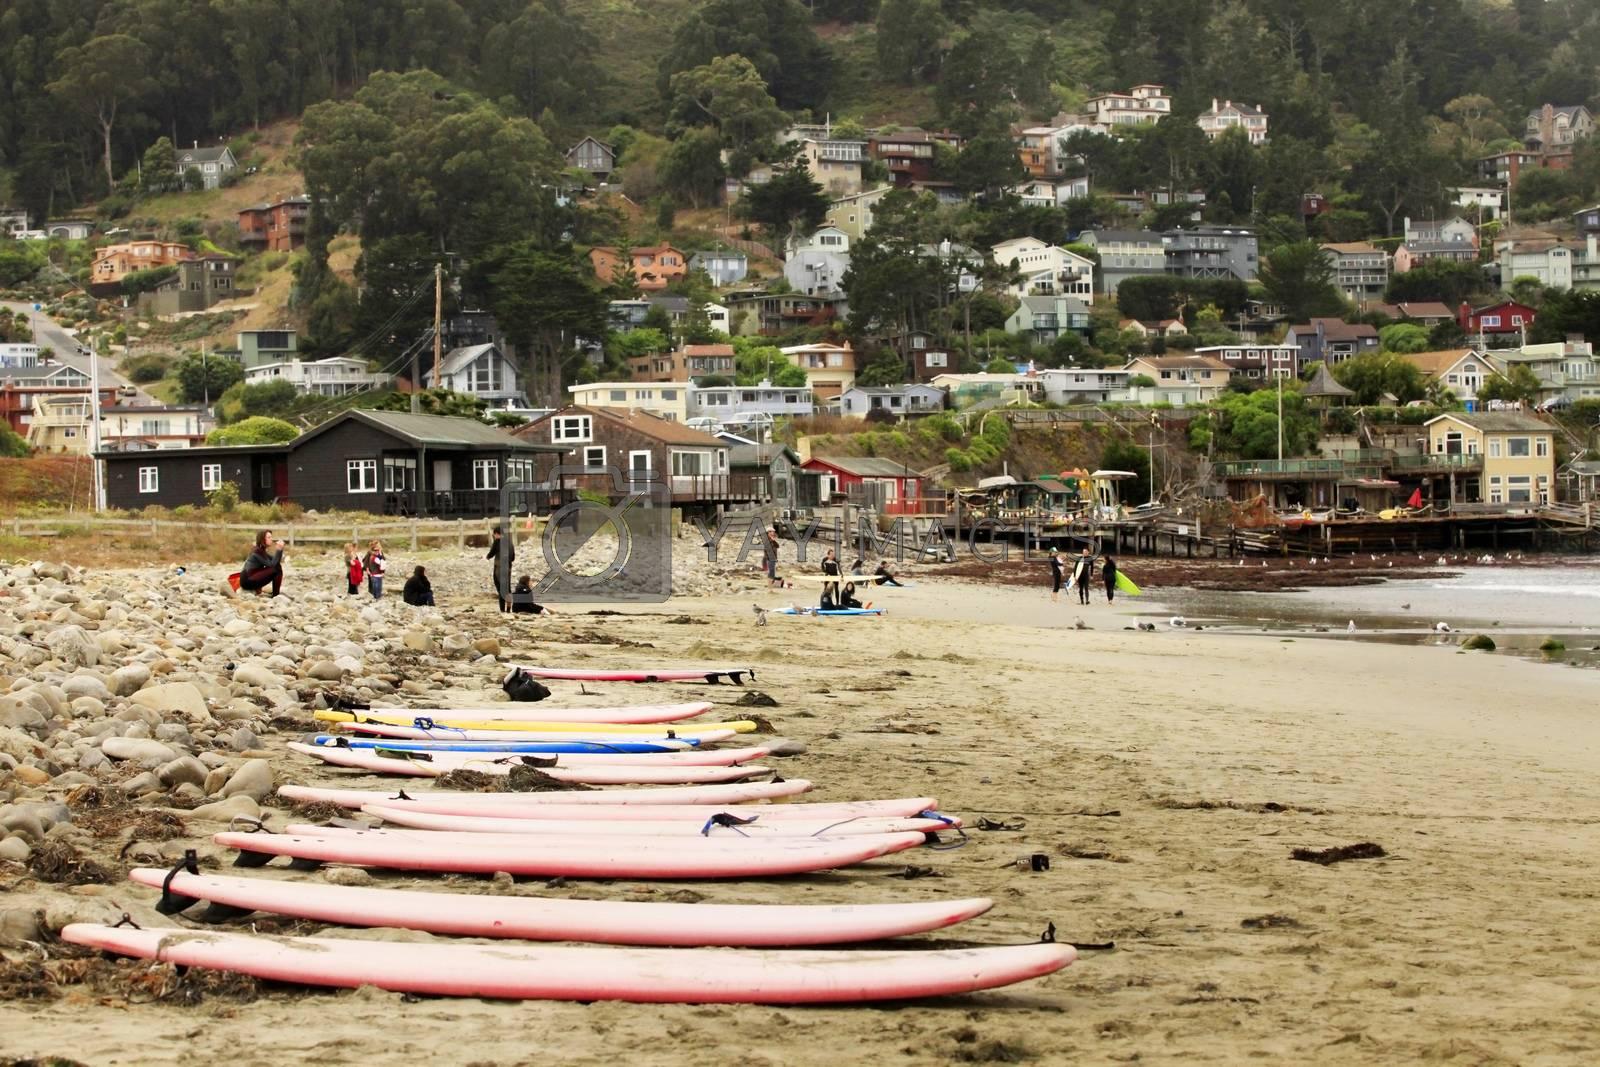 San Francisco, CA, USA - September 24, 2011: Pacifica State Beach in San Francisco